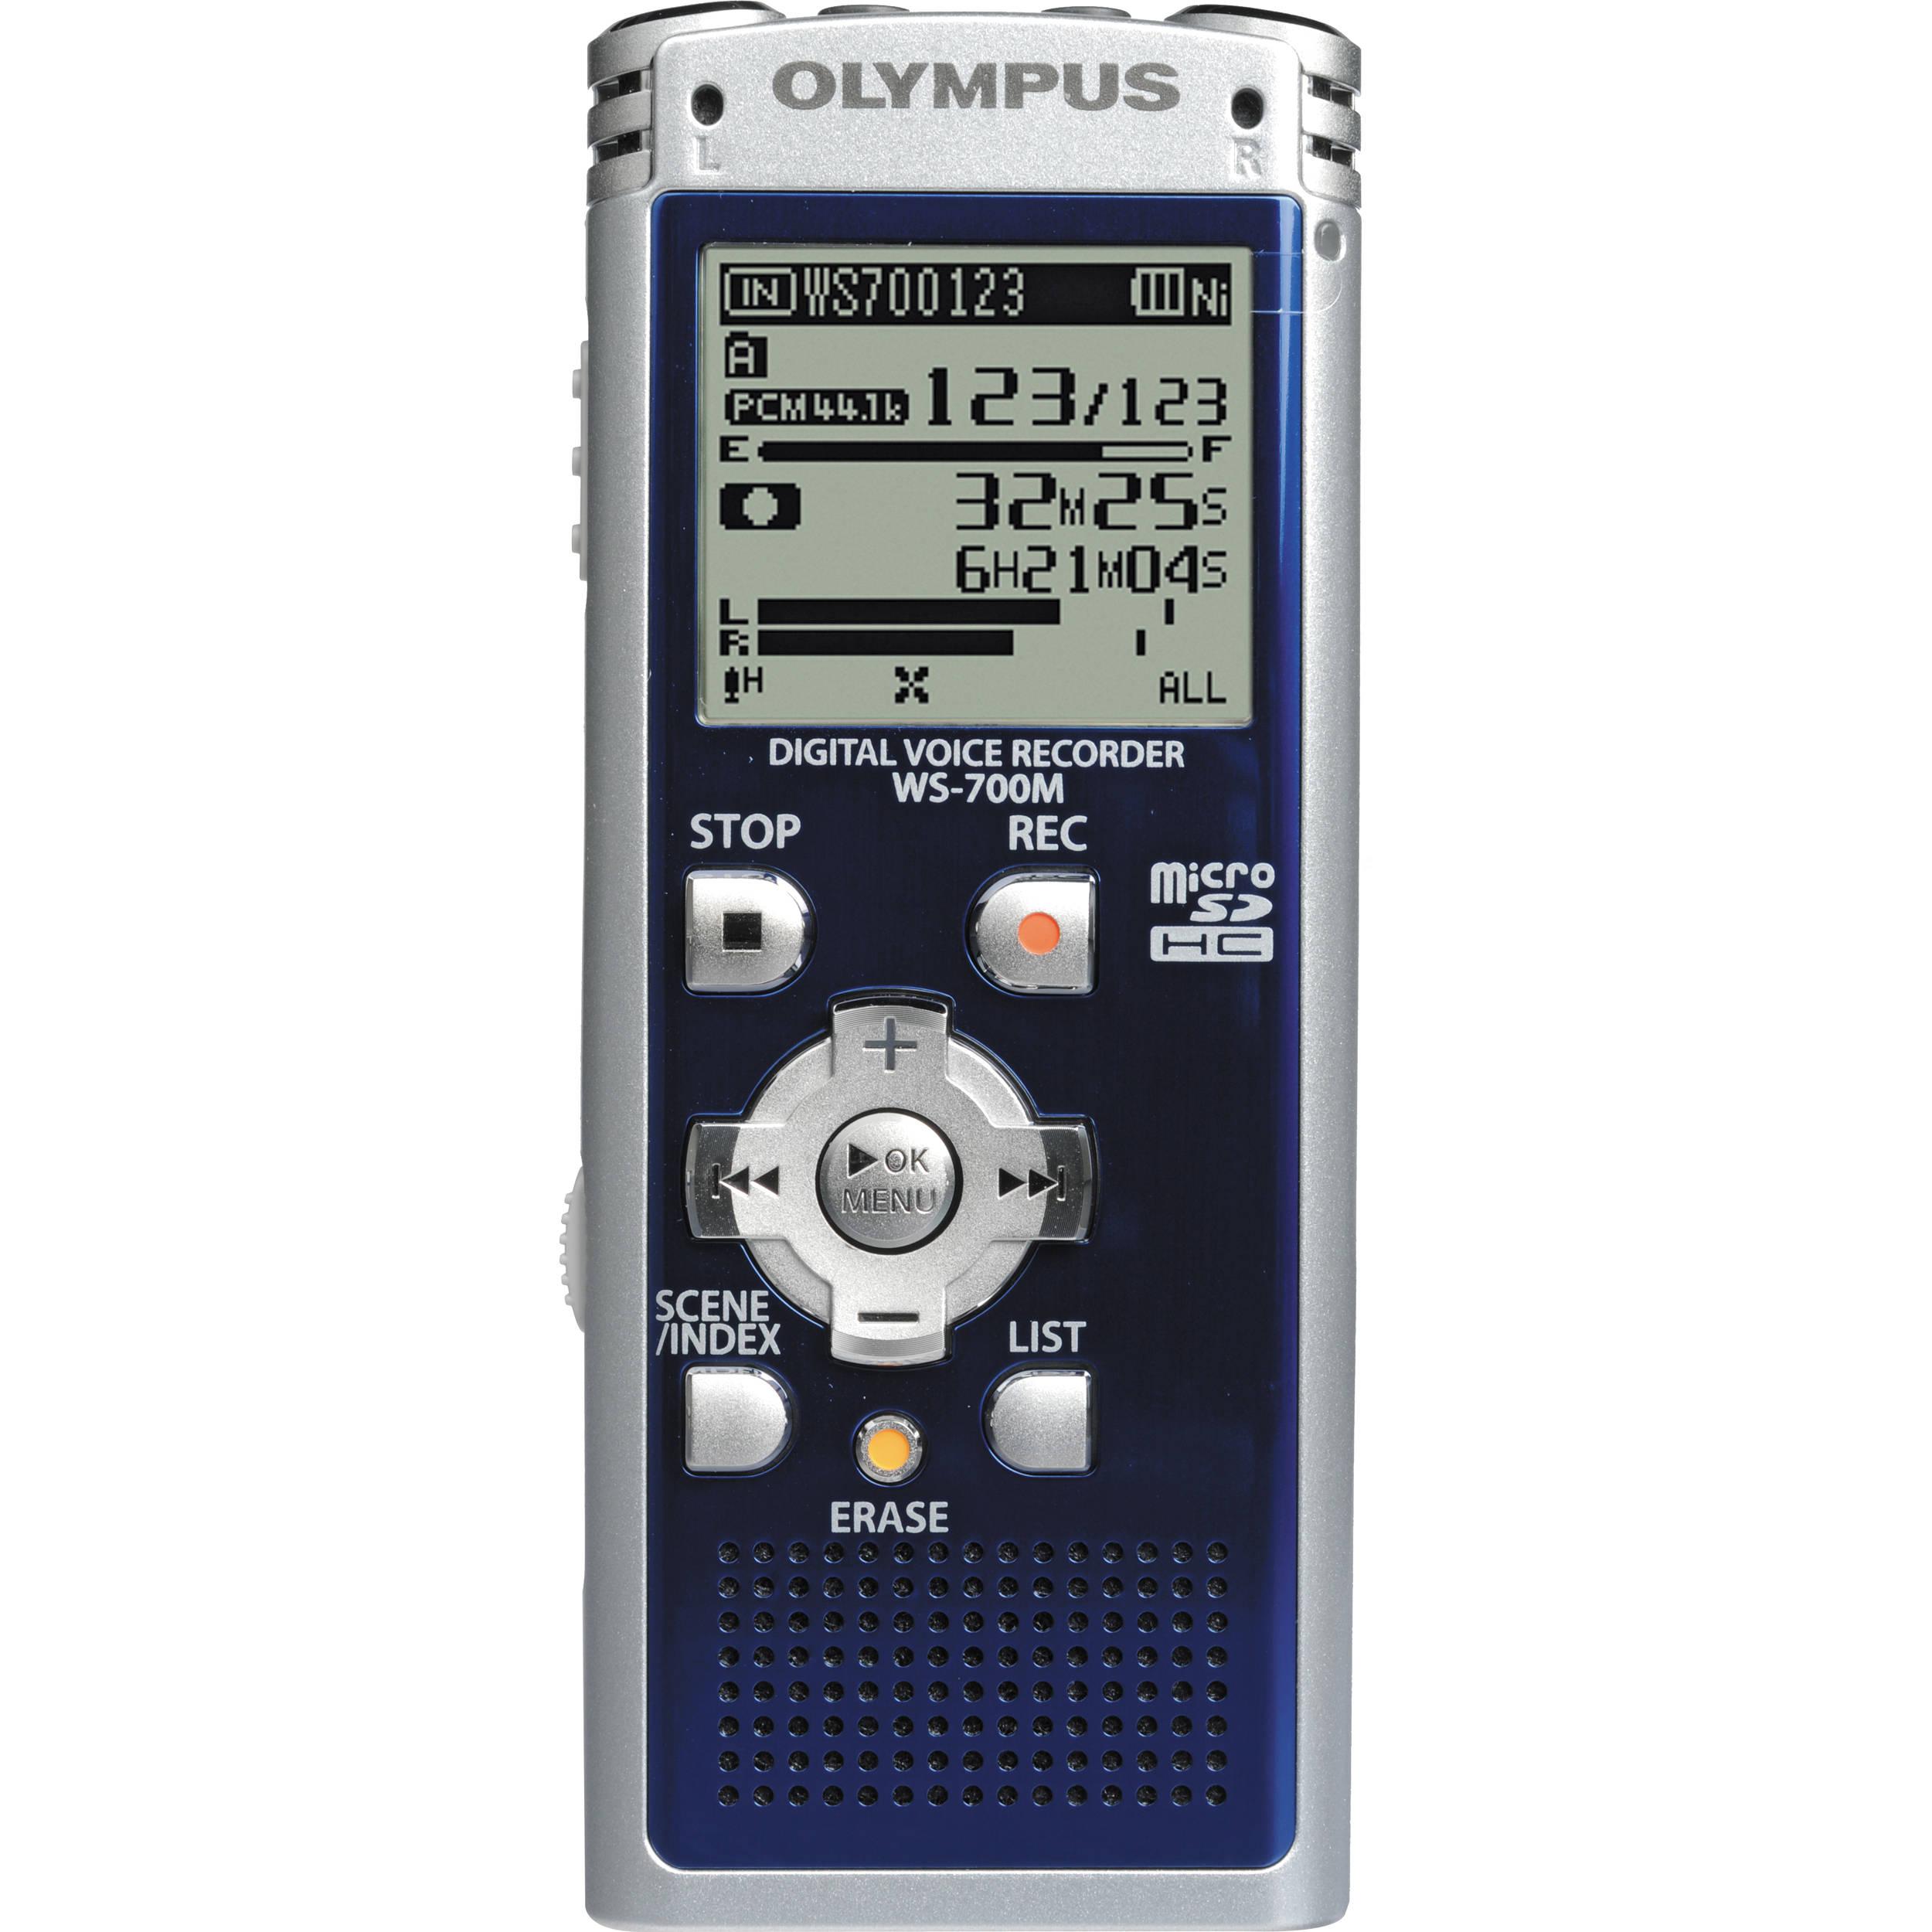 olympus ws 700m digital voice recorder blue 142625 b h photo rh bhphotovideo com Olympus VN-702PC Voice Recorder Olympus Voice Recorder VN-7200